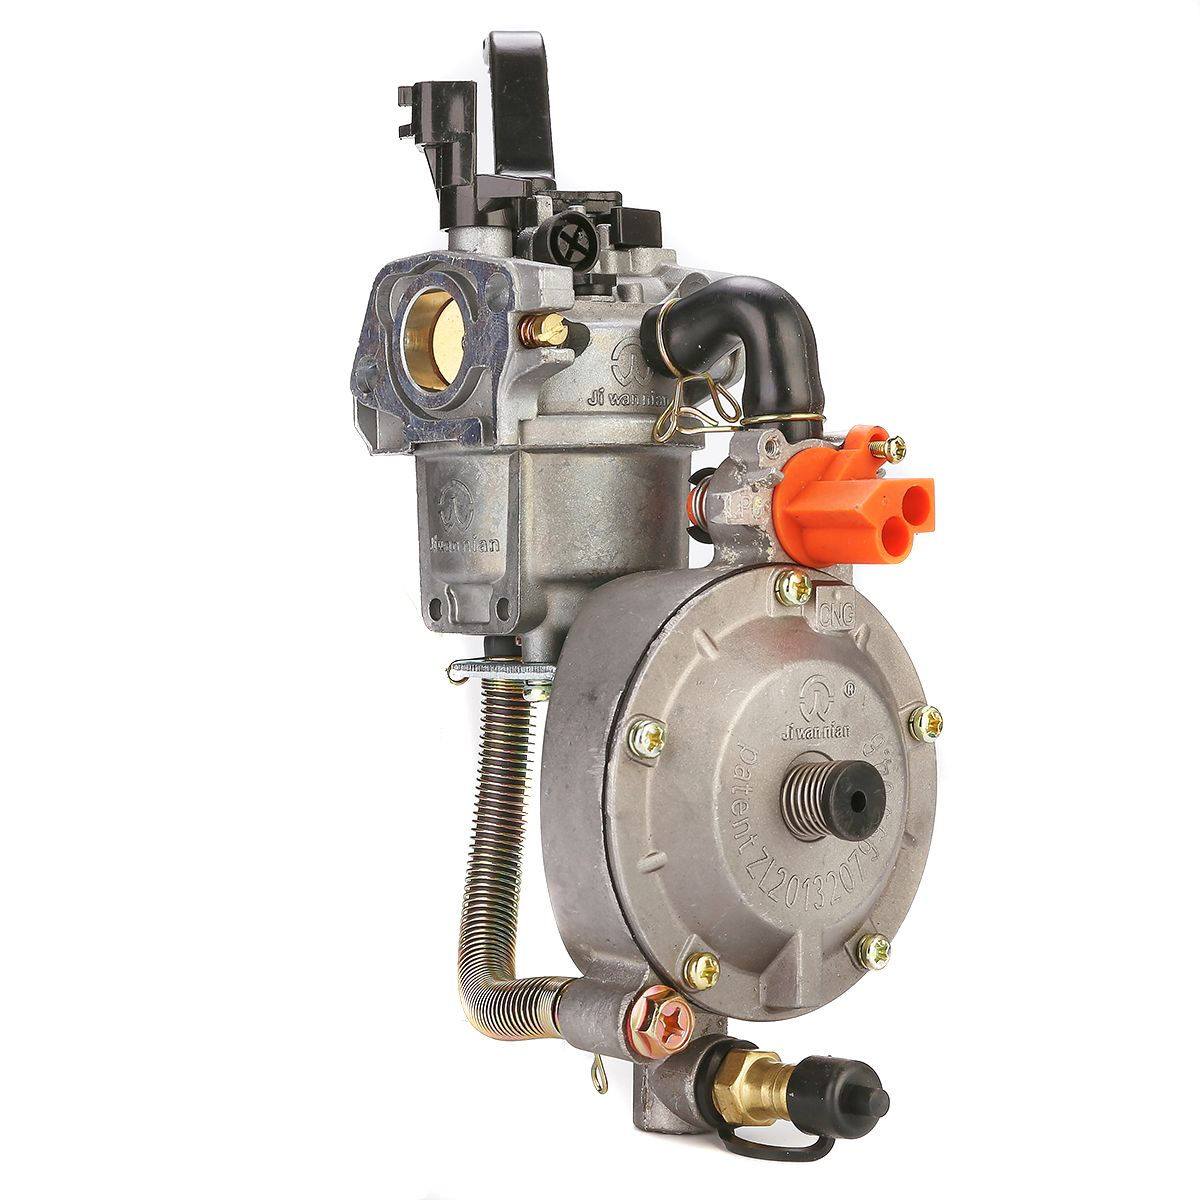 1PC Carburetor Carb Dual Fuel LPG Conversion Parts For GX200 170F Engine Mayitr Garden Tools Parts